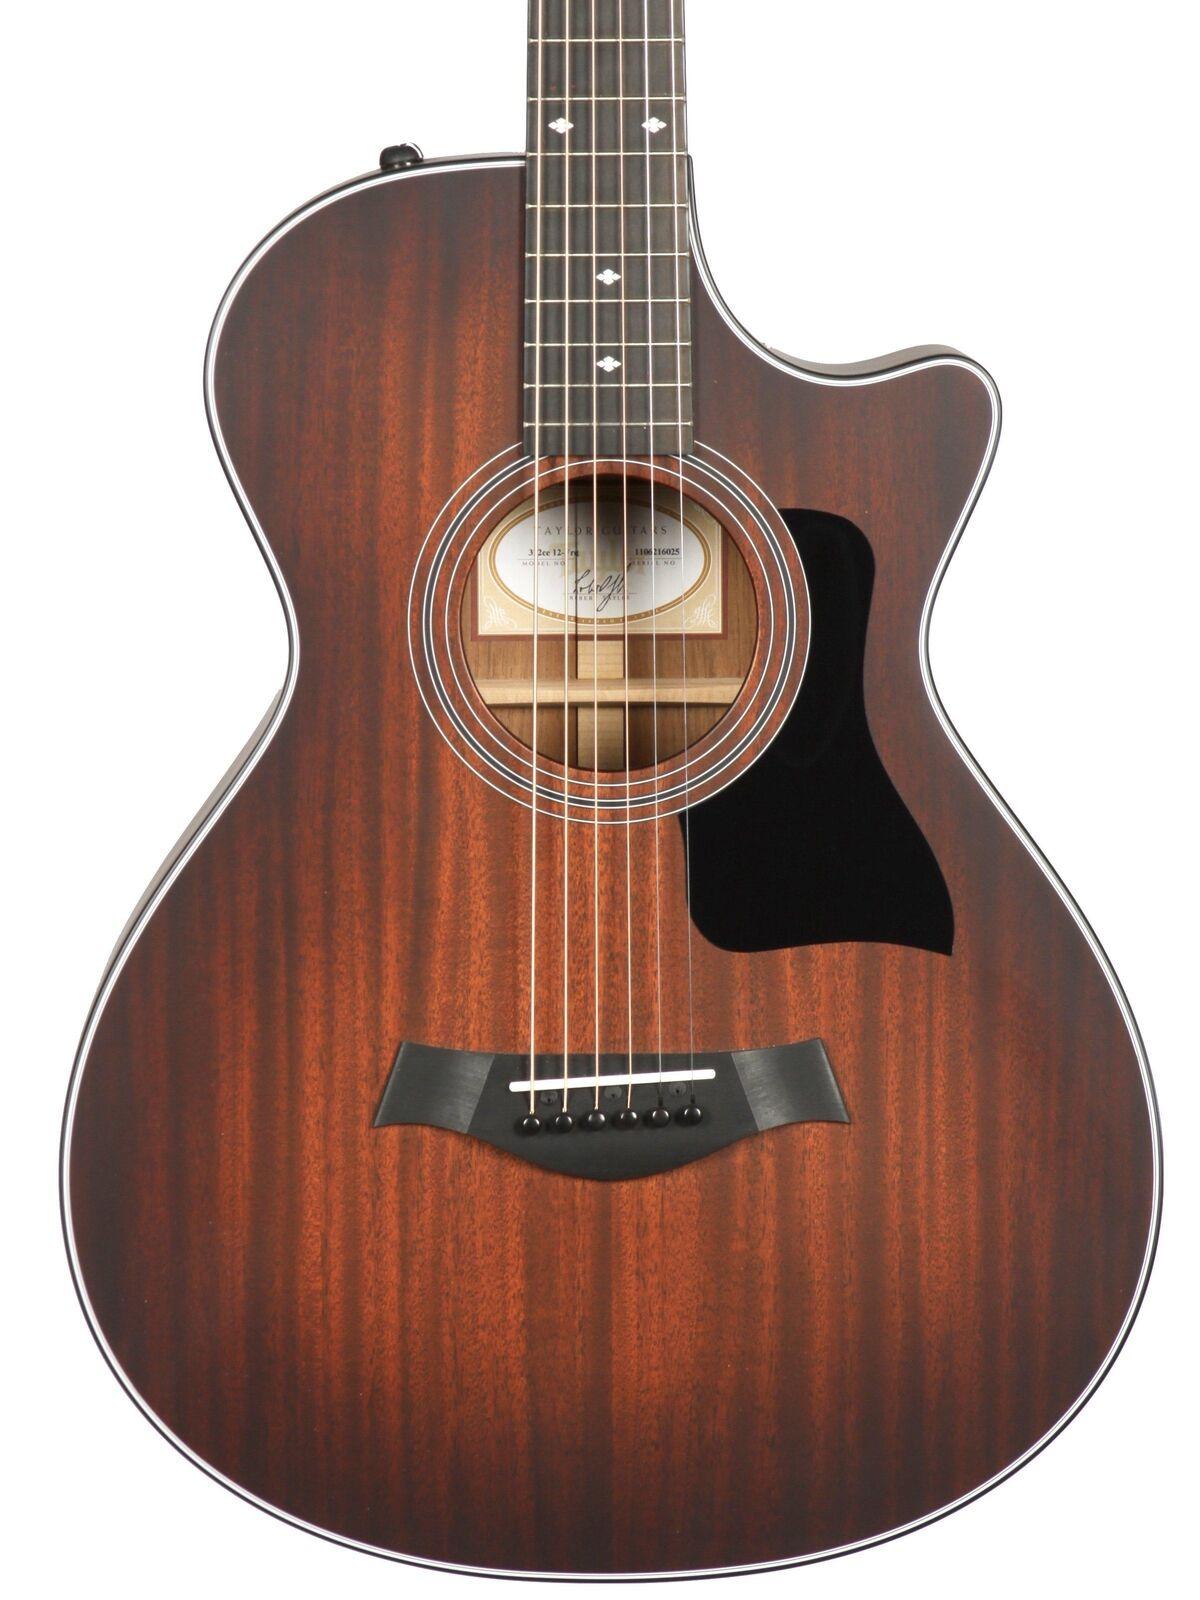 Gewa Vgs Konzertgitarre Pro Andalus Model 20 Natural Gloss Klassikgitarre Akustische Gitarren Musikinstrumente